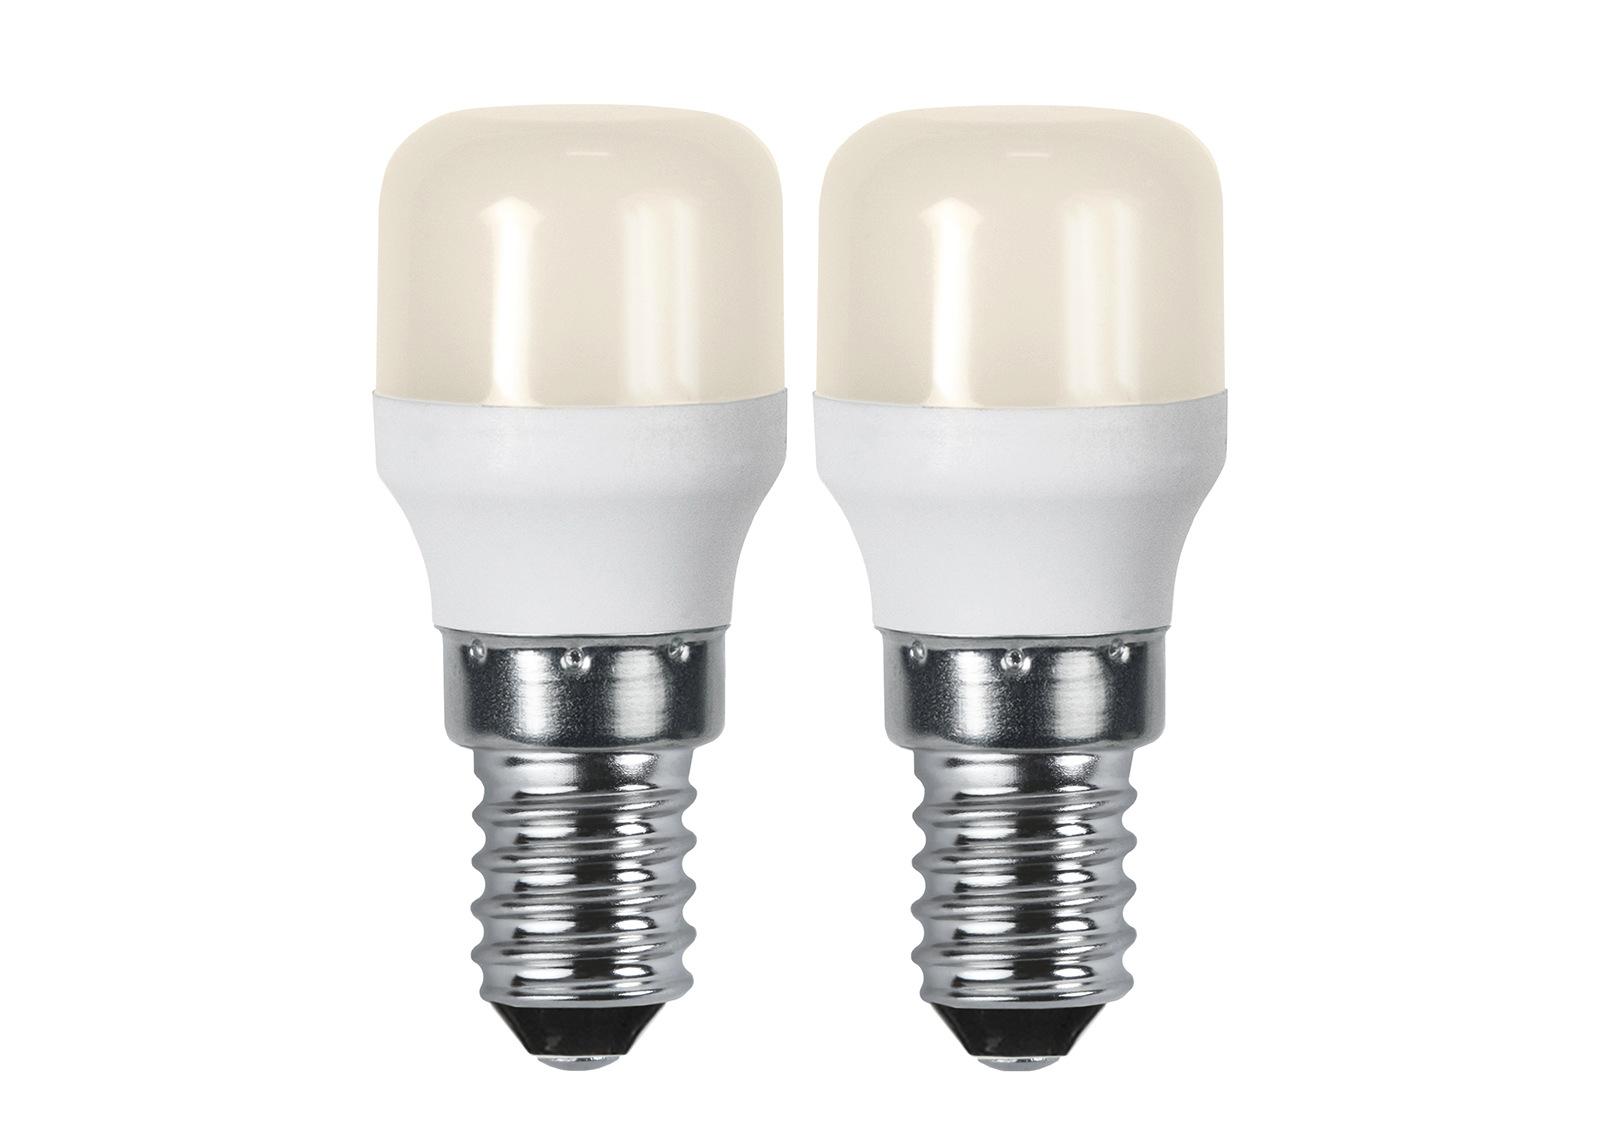 LED sähkölamput E14 1,4 W 2 kpl